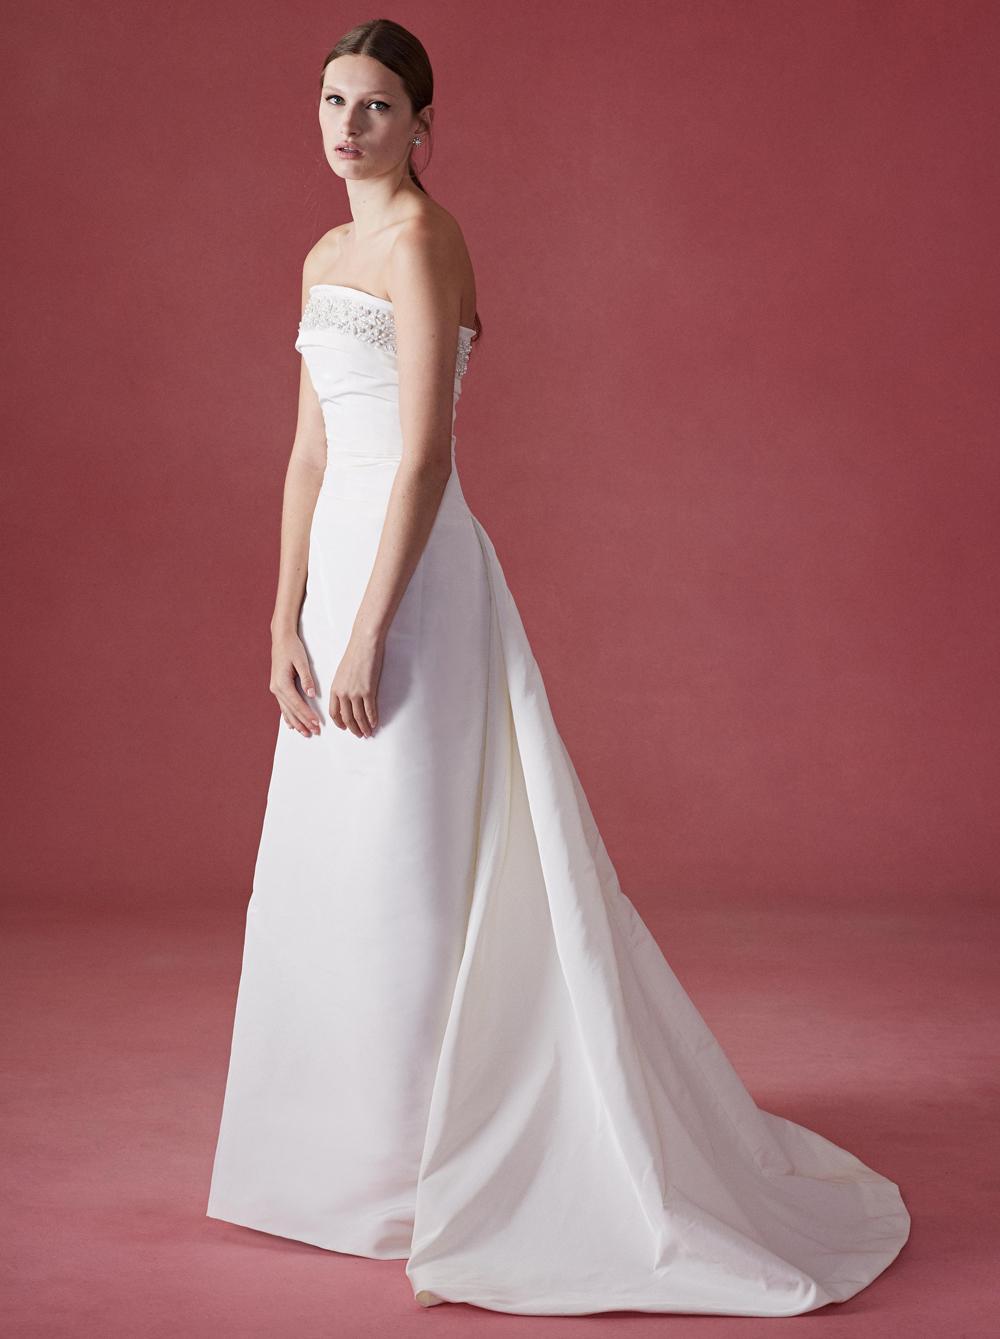 See Oscar De La Rentas Fall 2016 Wedding Dress Collection In Its Entirety